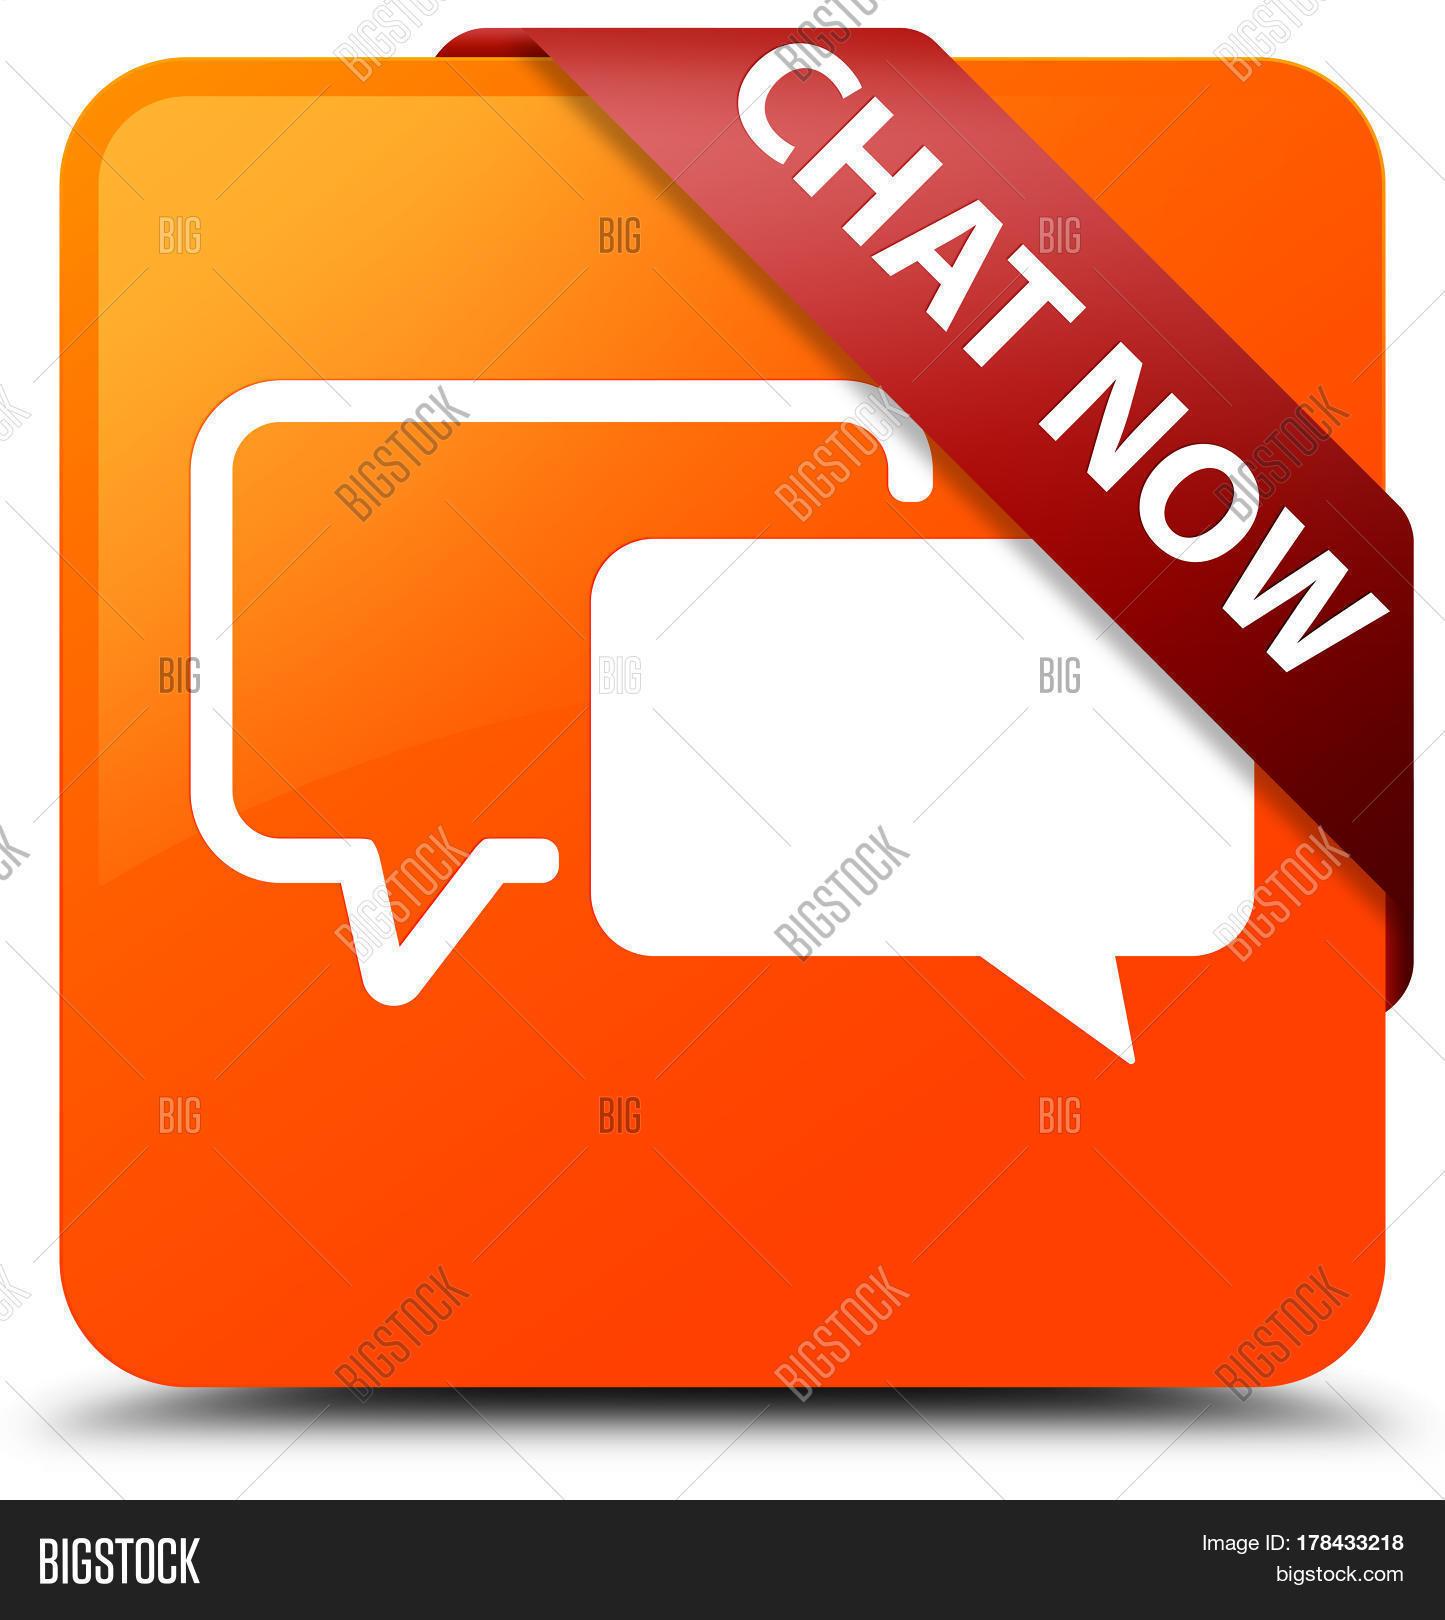 Chat now orange square button red image photo bigstock - Chat orange ...